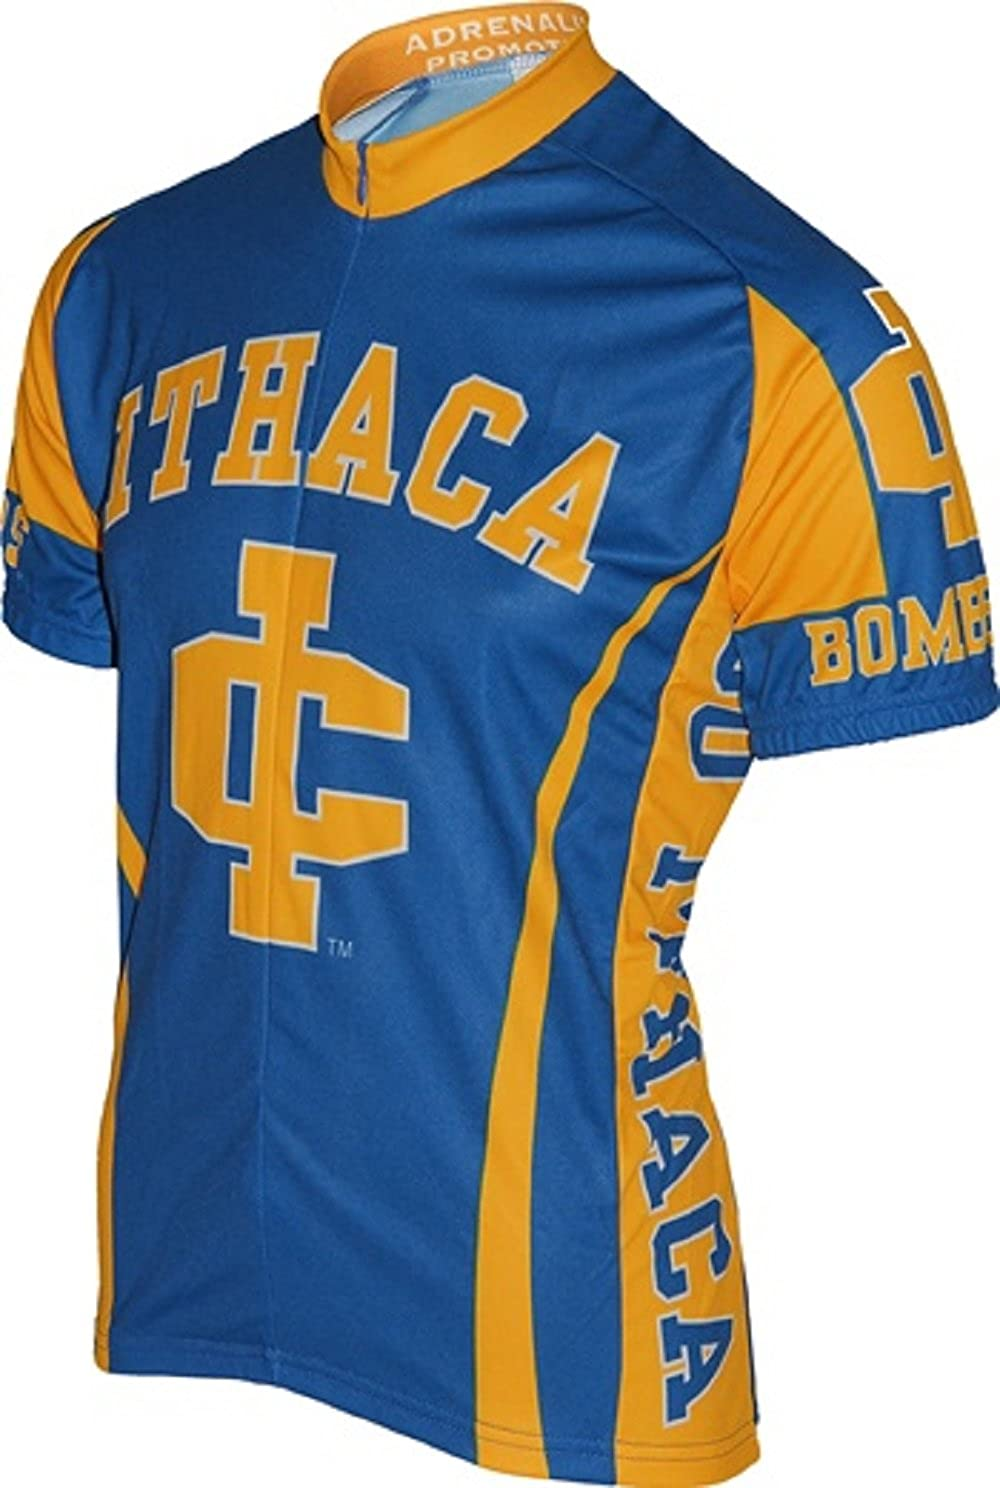 NCAAメンズAdrenaline販促Ithaca Cycling Jersey 3L  B01JFWO4KA